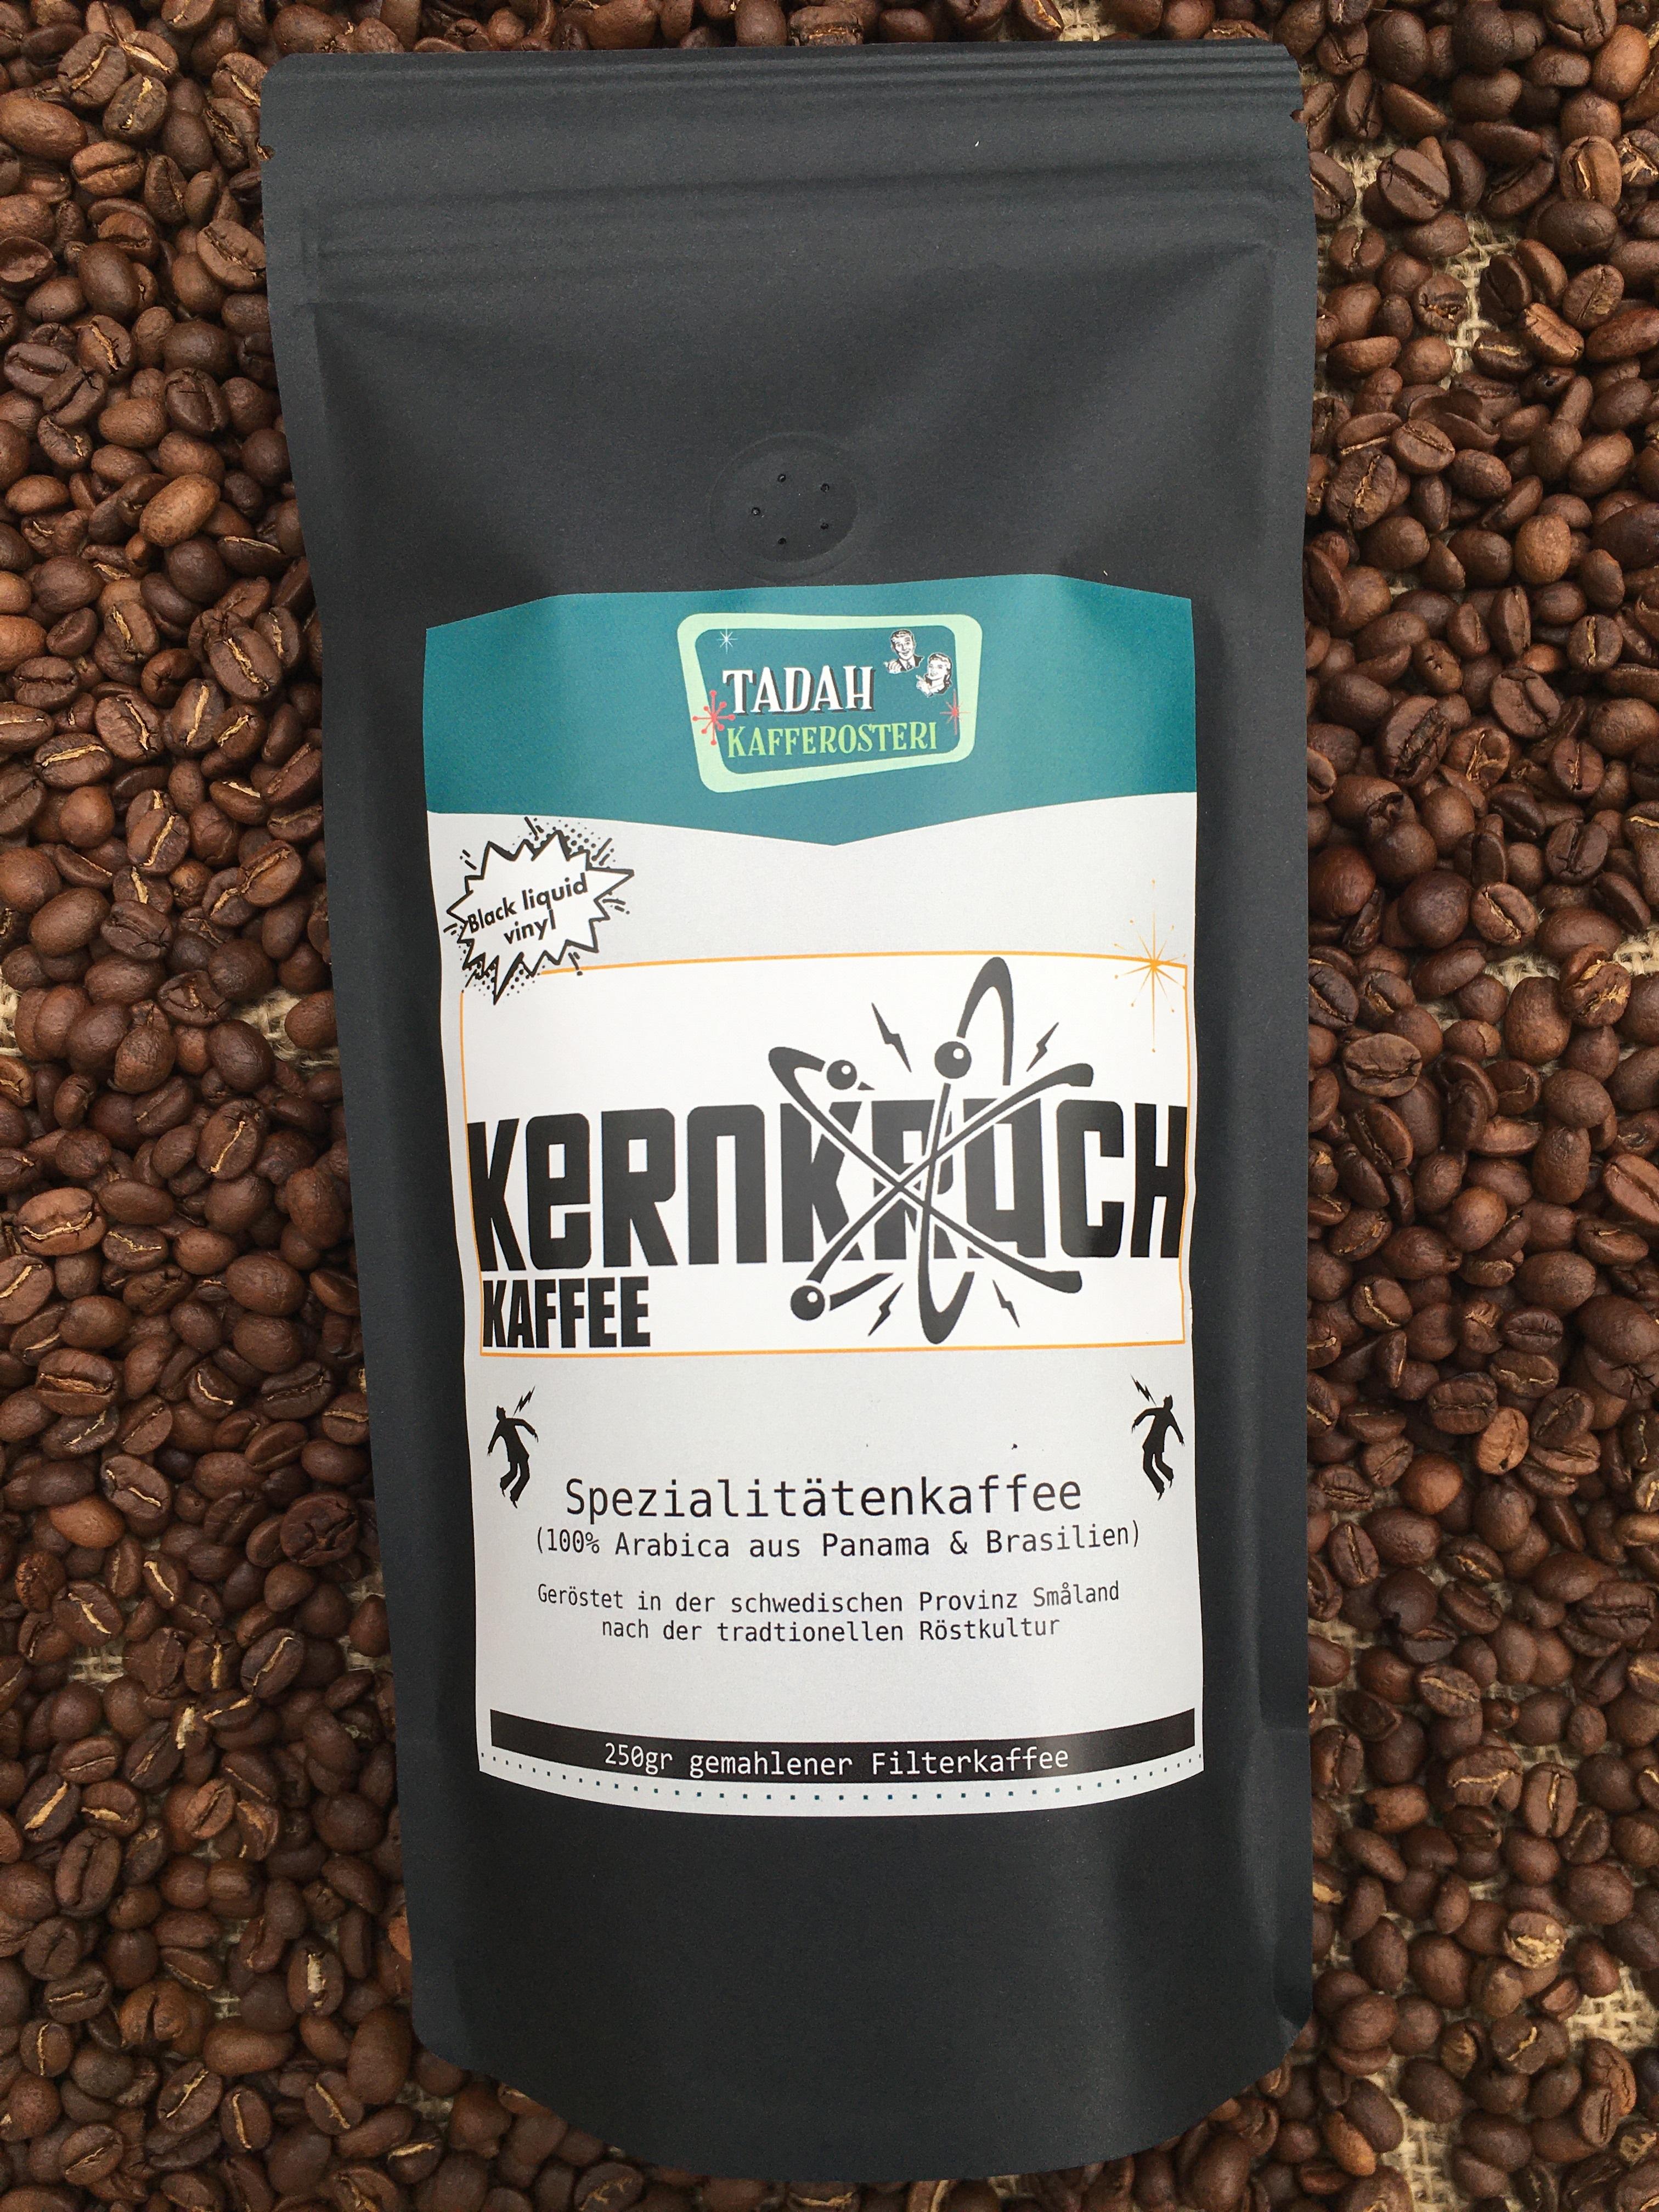 Kernkrach Kaffee